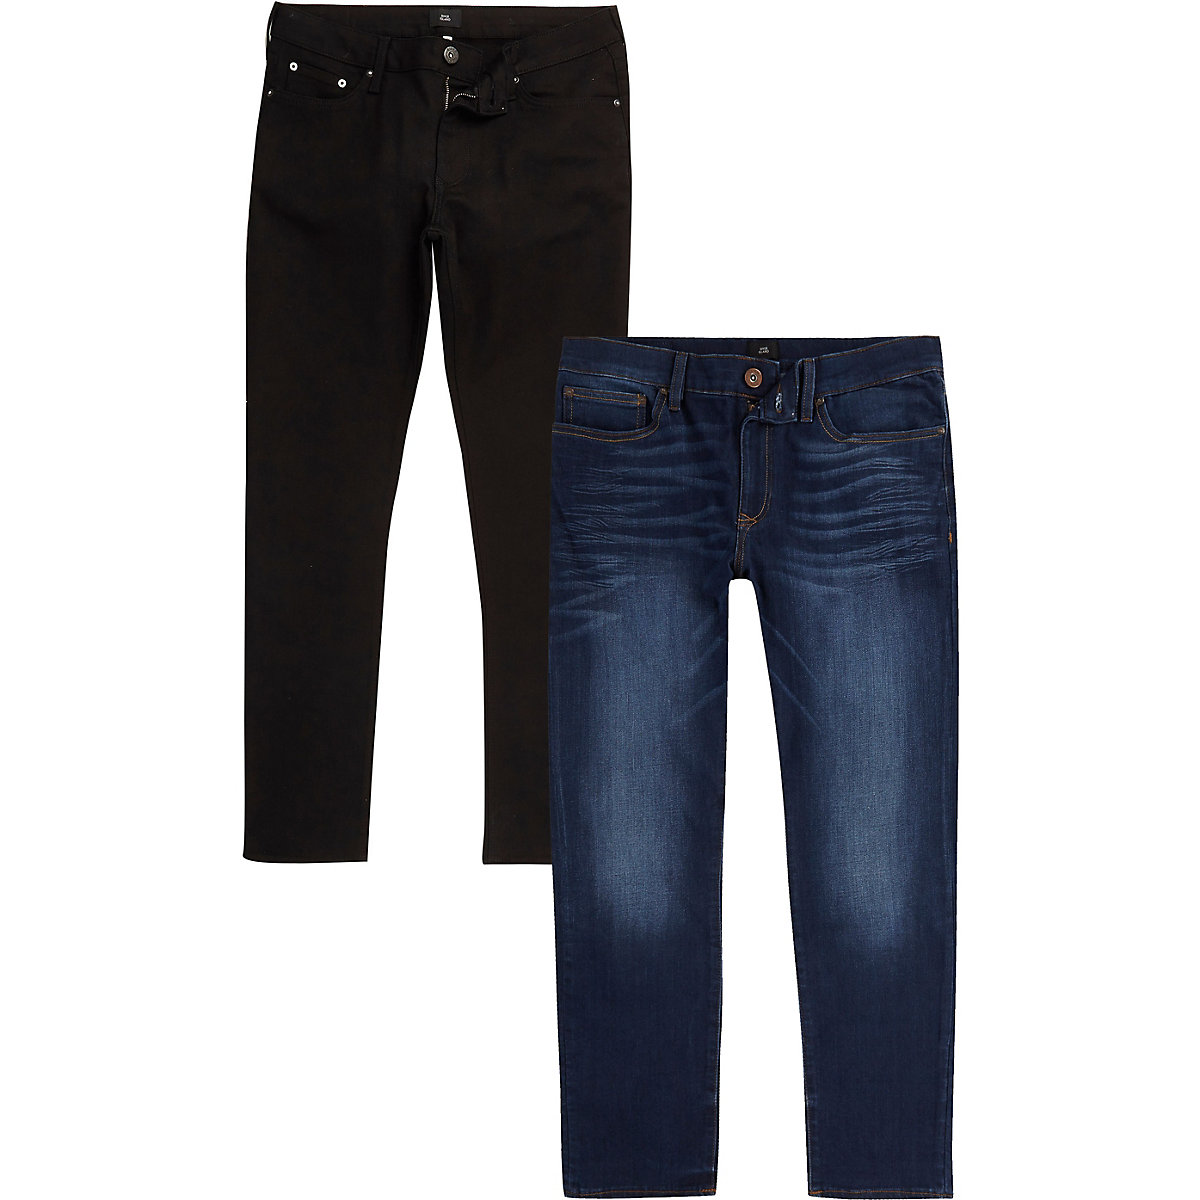 Black slim fit jeans multipack